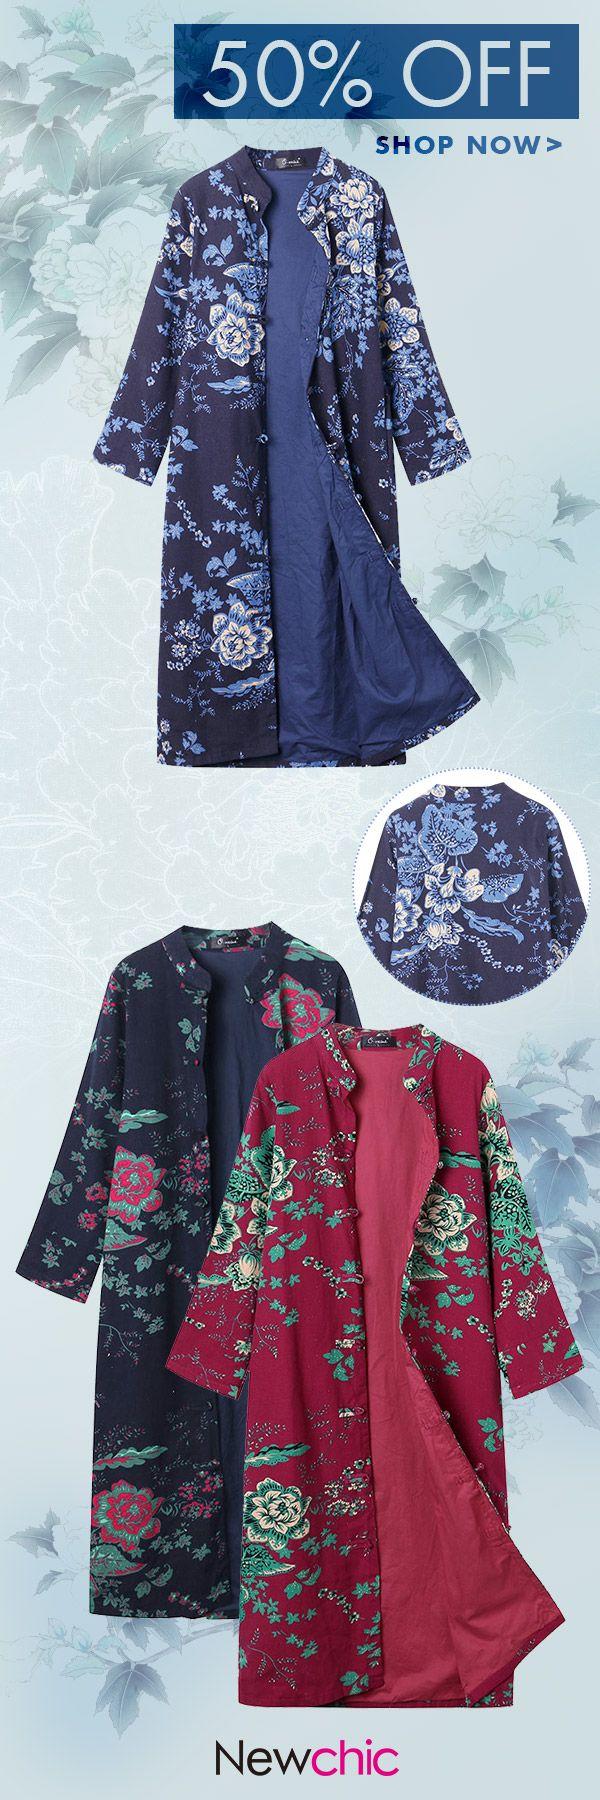 O-NEWE Vintage Women Flower Printed Chinese Frog Long Coat #coat #spring #fashion